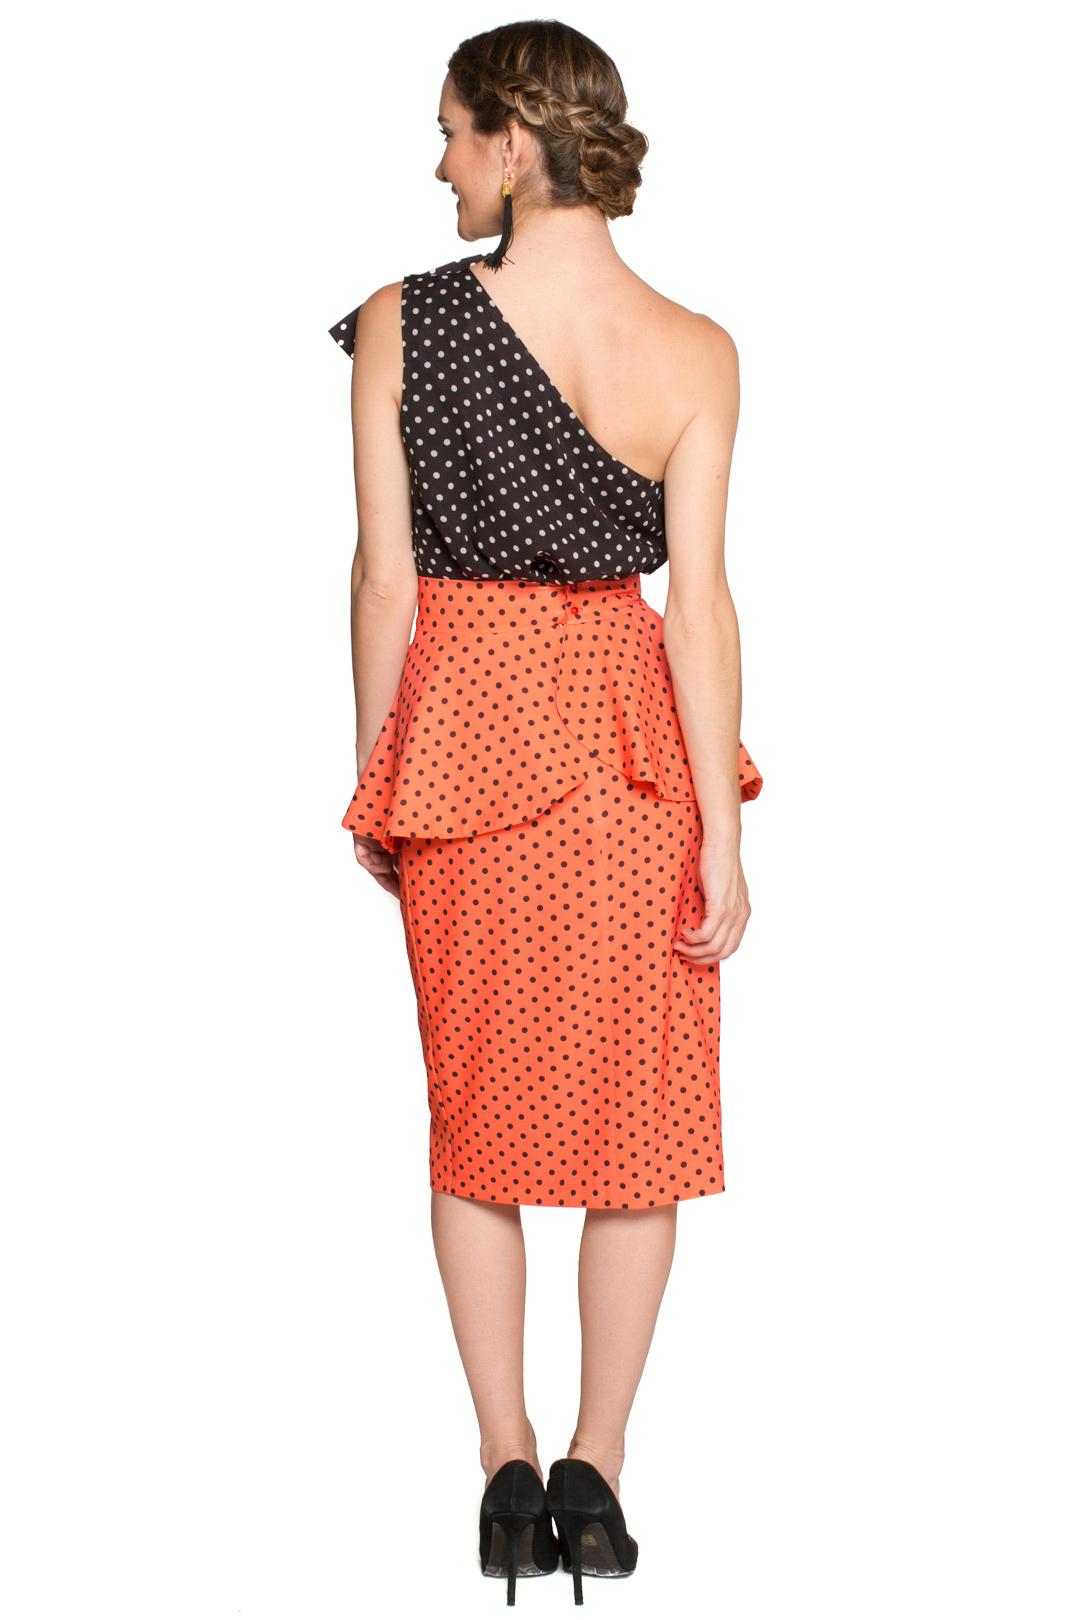 left - Falda Halle Orange